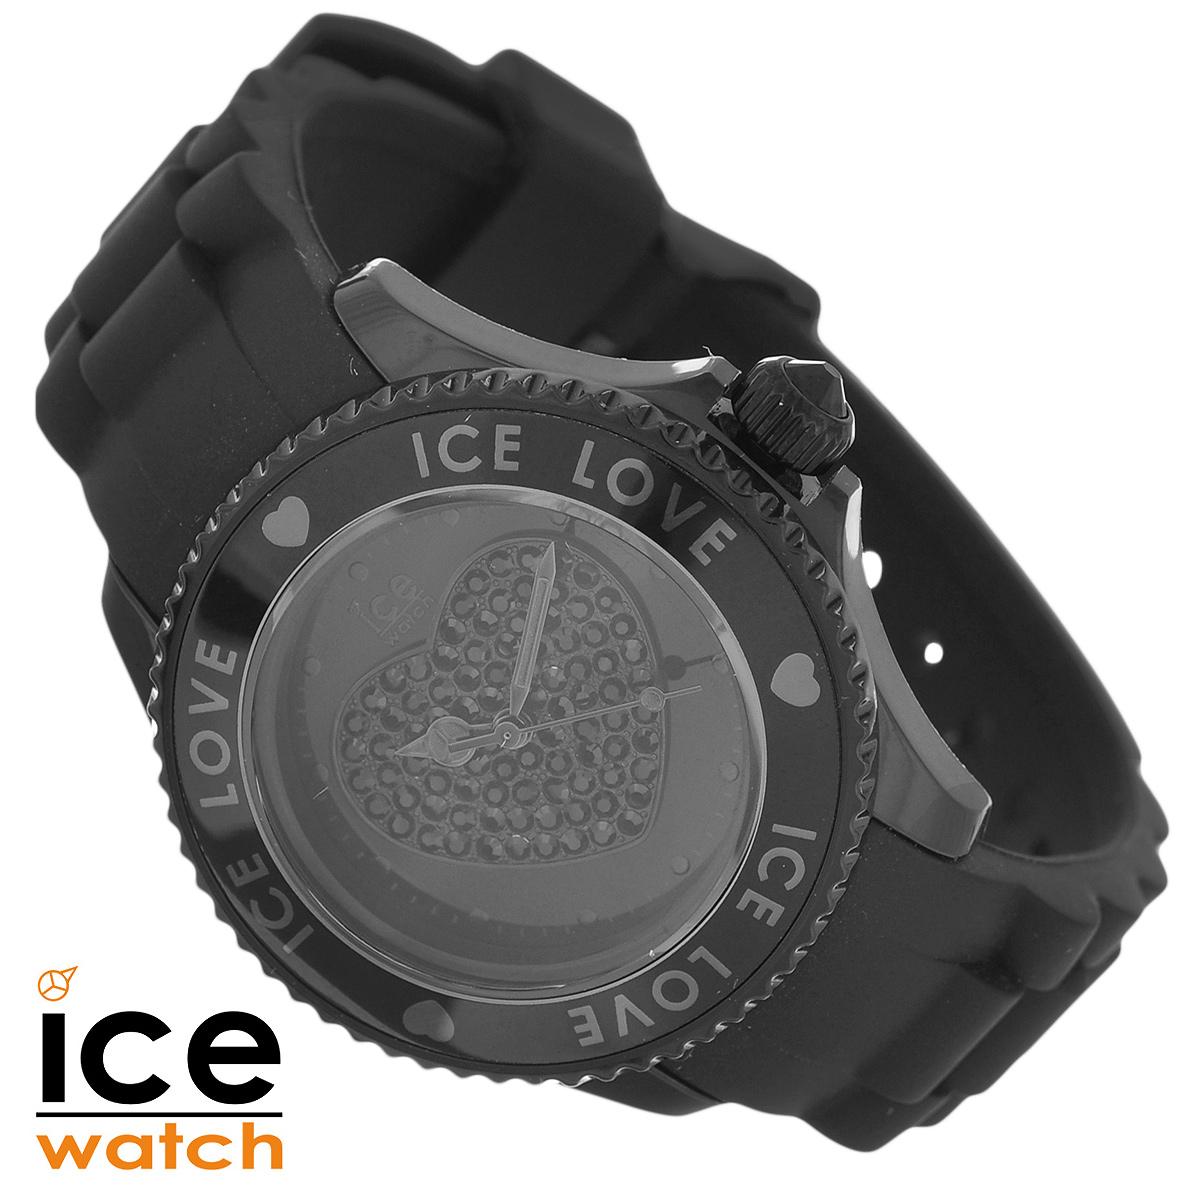 Zakazat.ru: Часы женские наручные Ice Watch, цвет: черный. LO.BK.S.S.10 Small